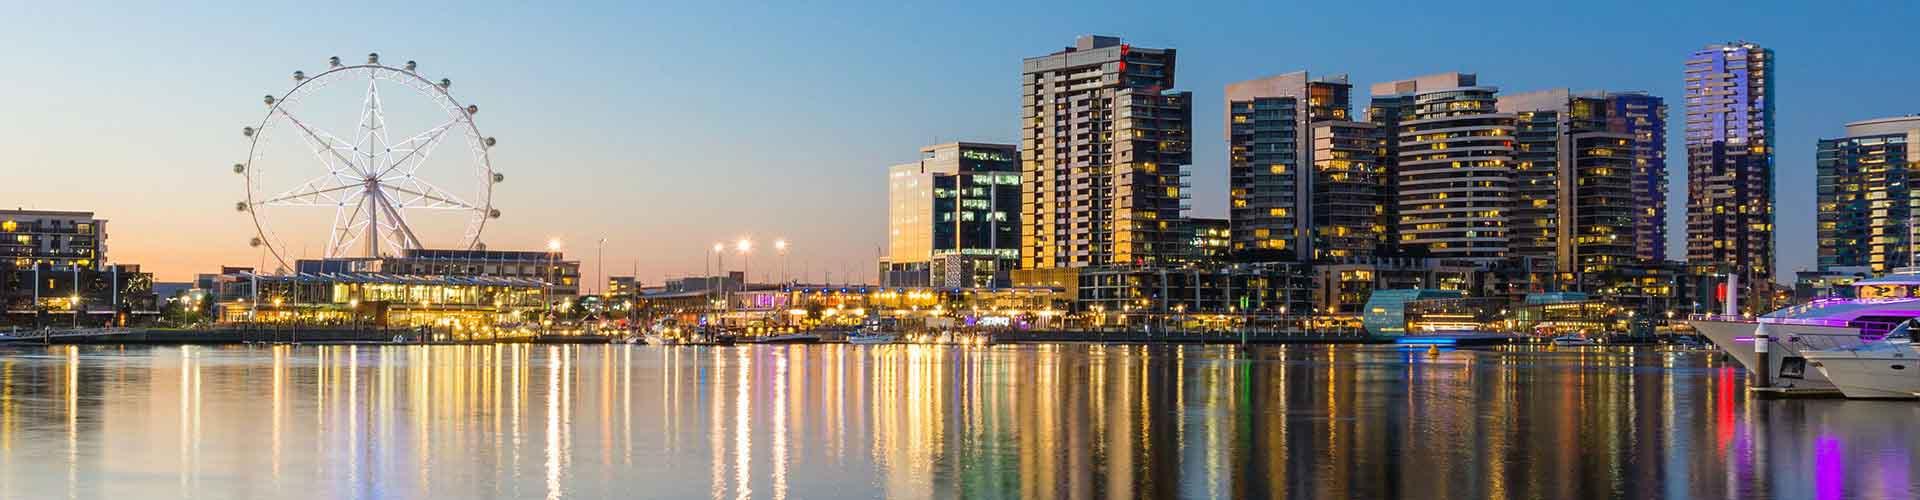 Melbourne – Retkeily kaupungiosassa Southbank. Melbourne -karttoja, valokuvia ja arvosteluja kaikista Melbourne -retkeilyalueista.